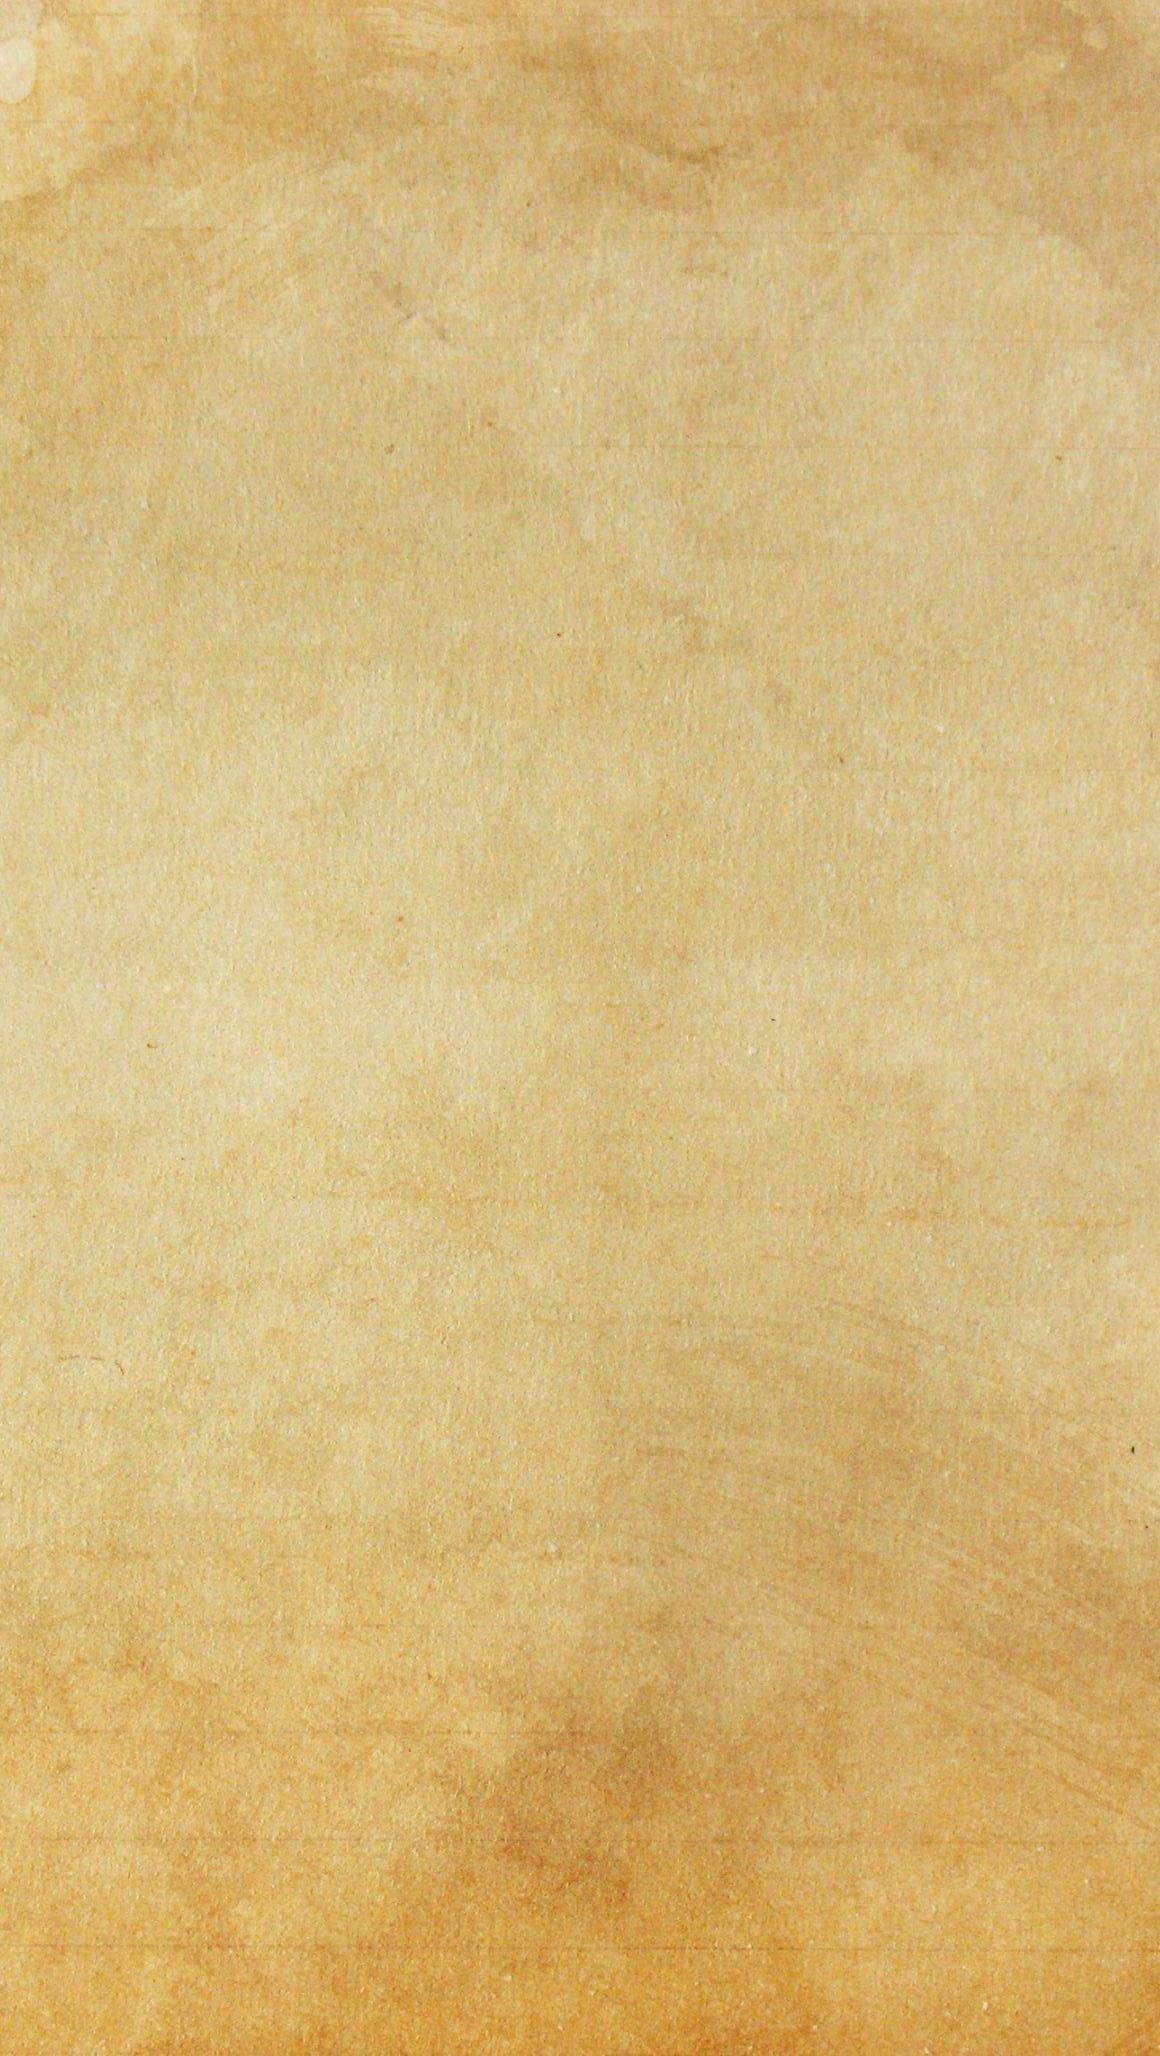 Wallpaper Old texture crumpled brown paper Vertical